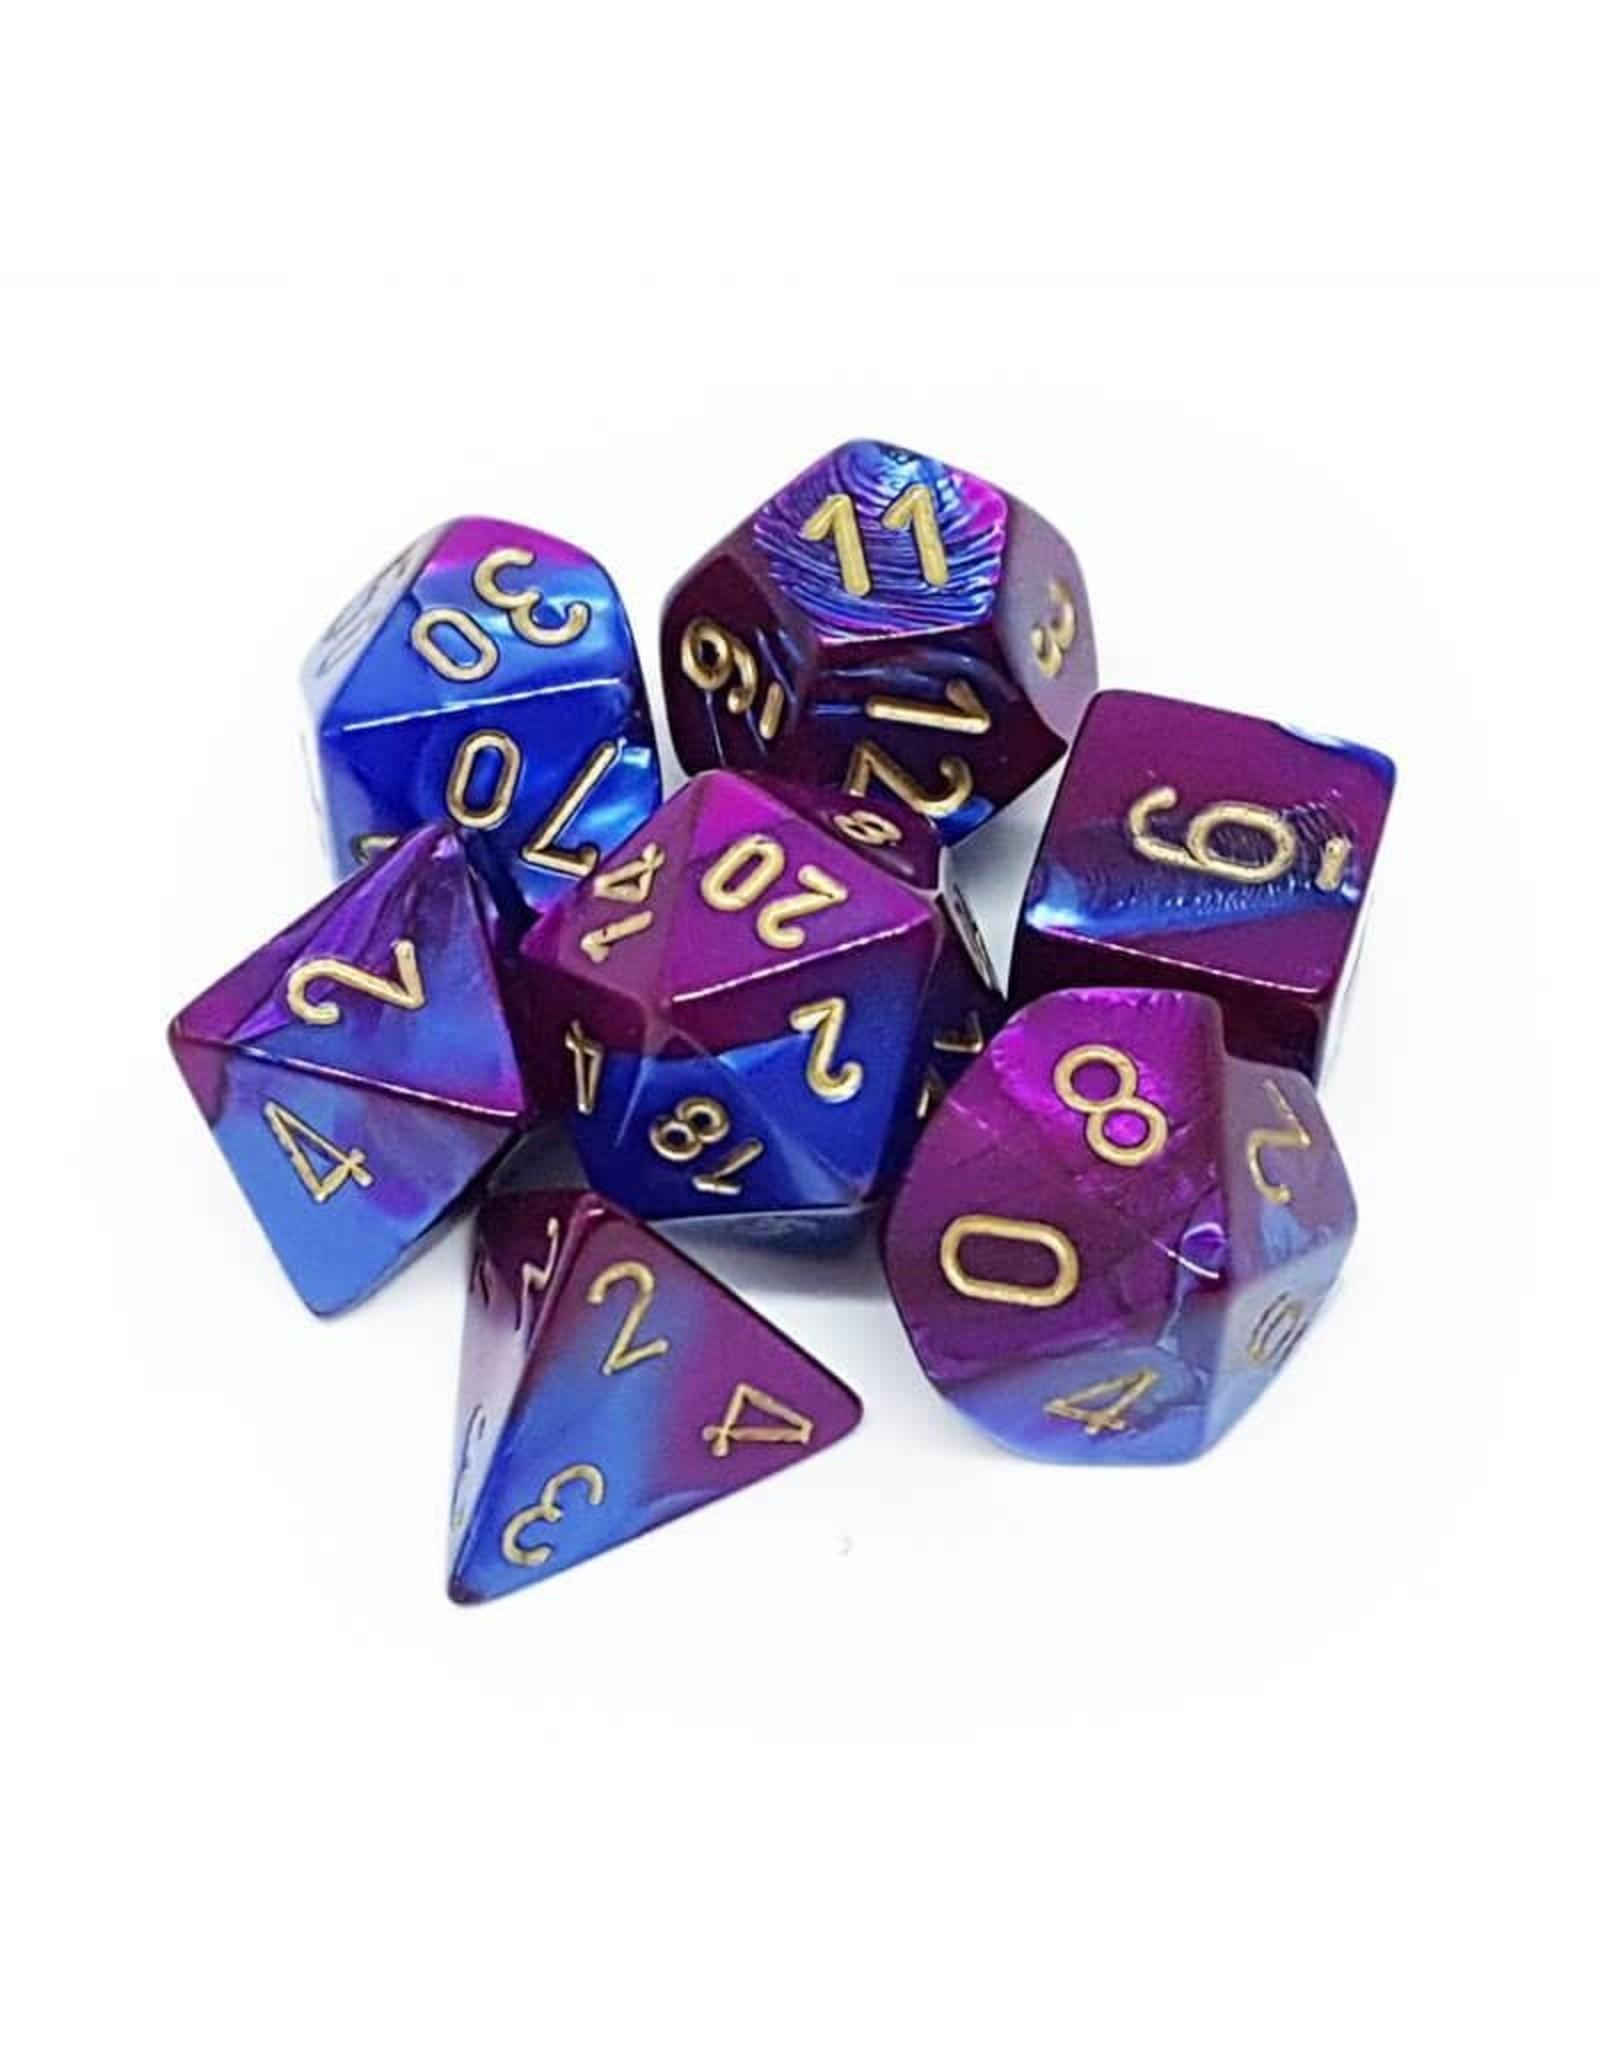 Chessex Gemini 2: Poly Blue Purple/Gold (7)